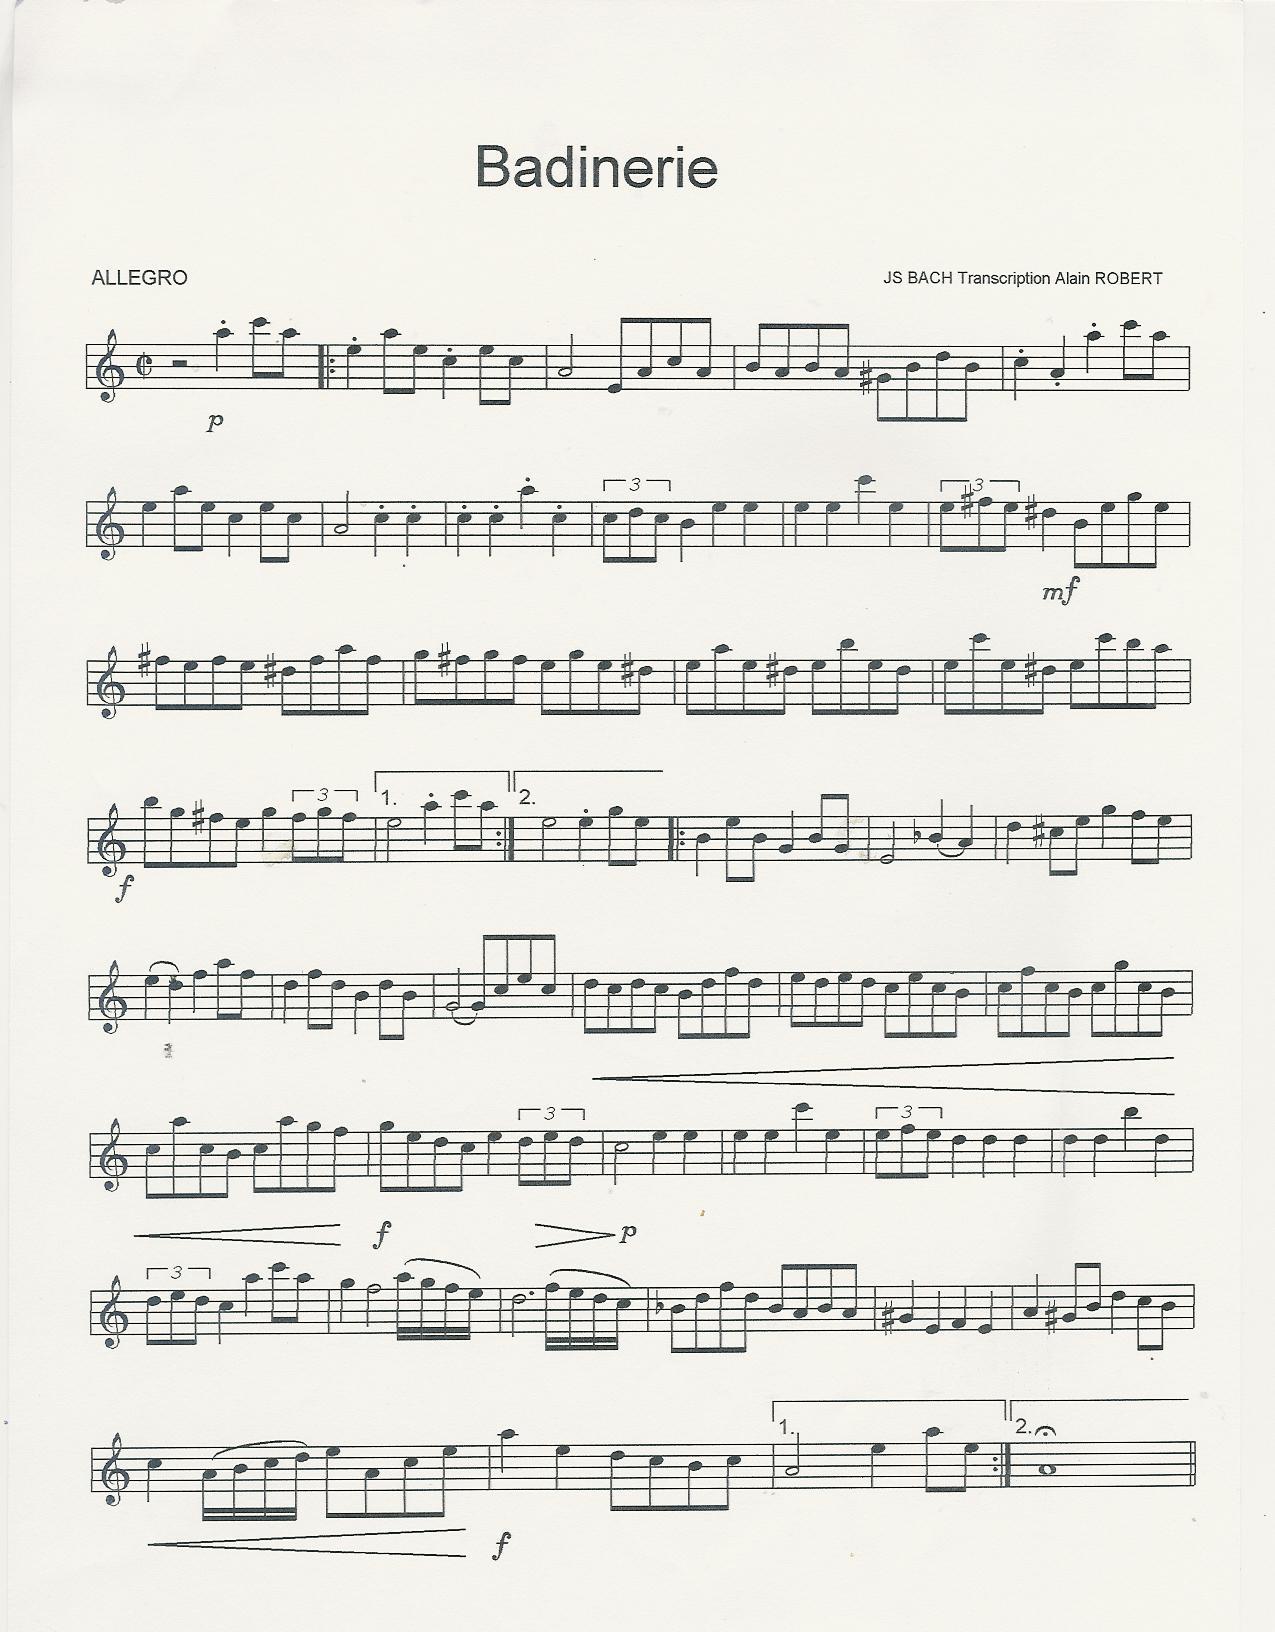 Badinarie de J. S. Bach Partitura para flauta, violin, saxo alto, tenor, soprano, trompa, clarinete, corno inglés, trompeta, oboe.... Música Clásica.